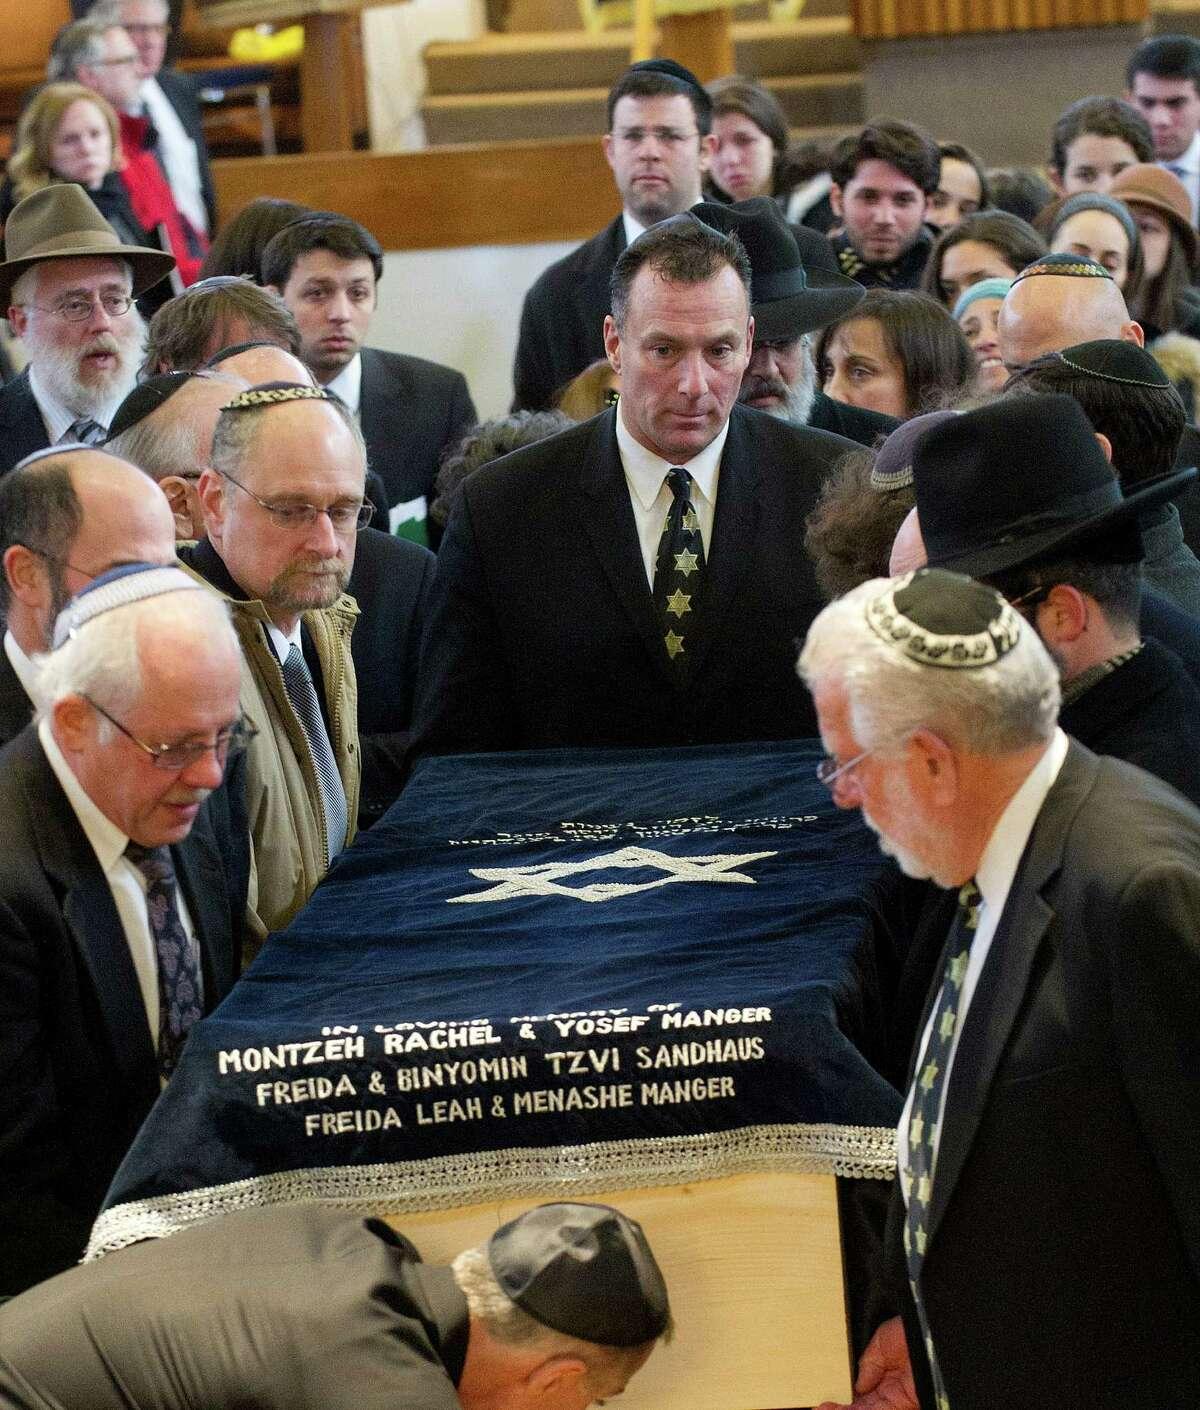 The recessional exits the funeral for Rabbi Joseph Ehrenkrantz at Agudath Shalom on Tuesday, February 25, 2014.